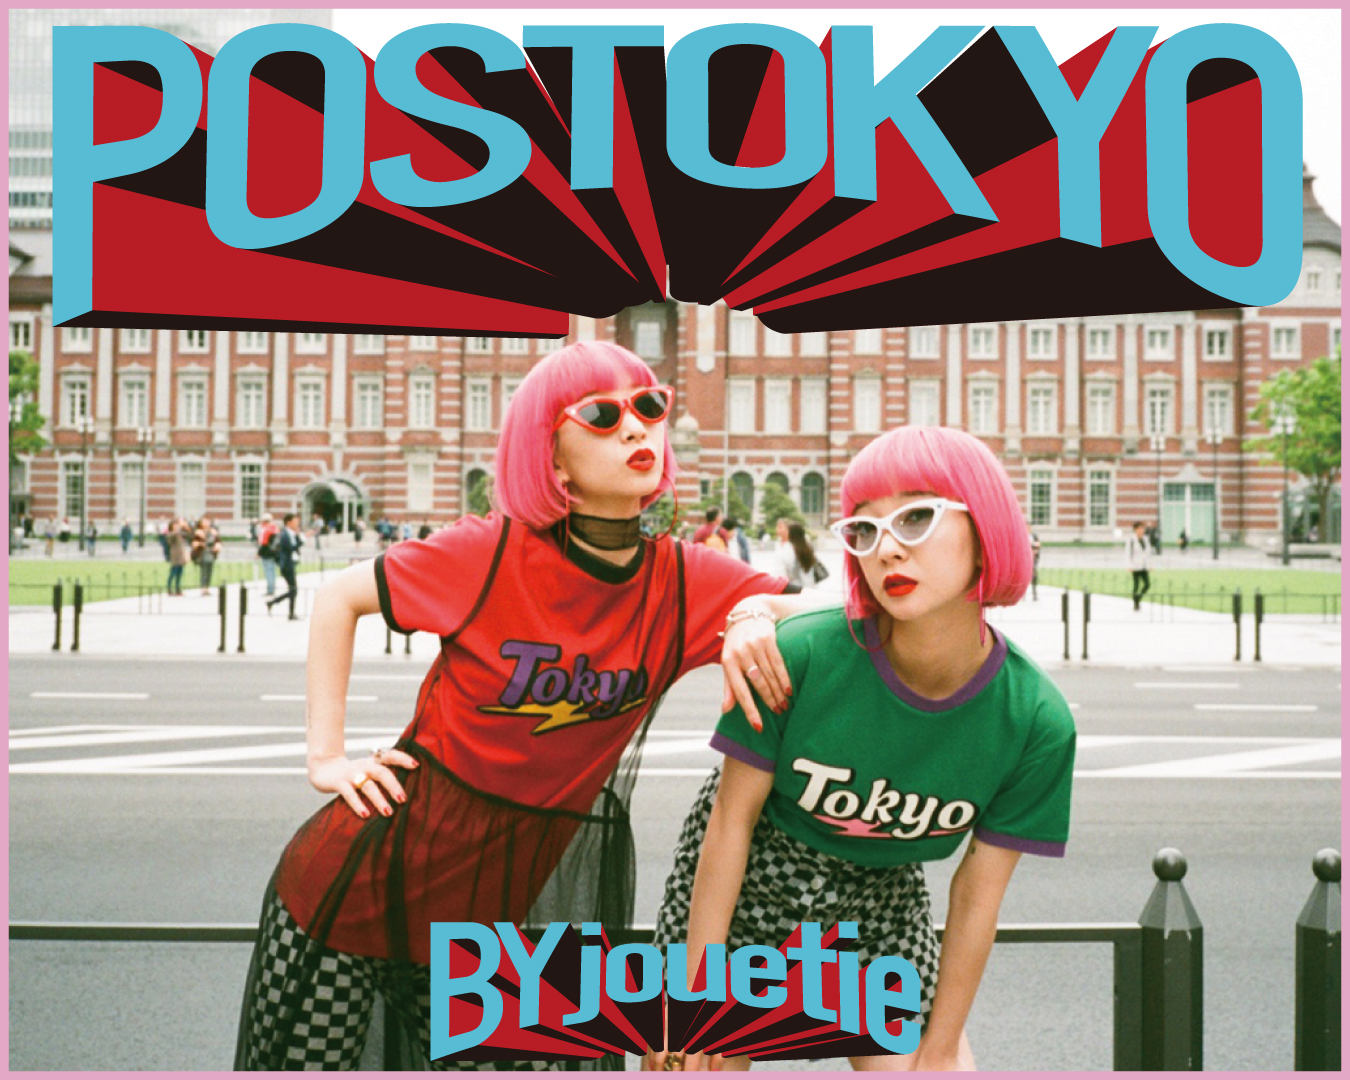 【souvenir shop】POSTOKYO by jouetie